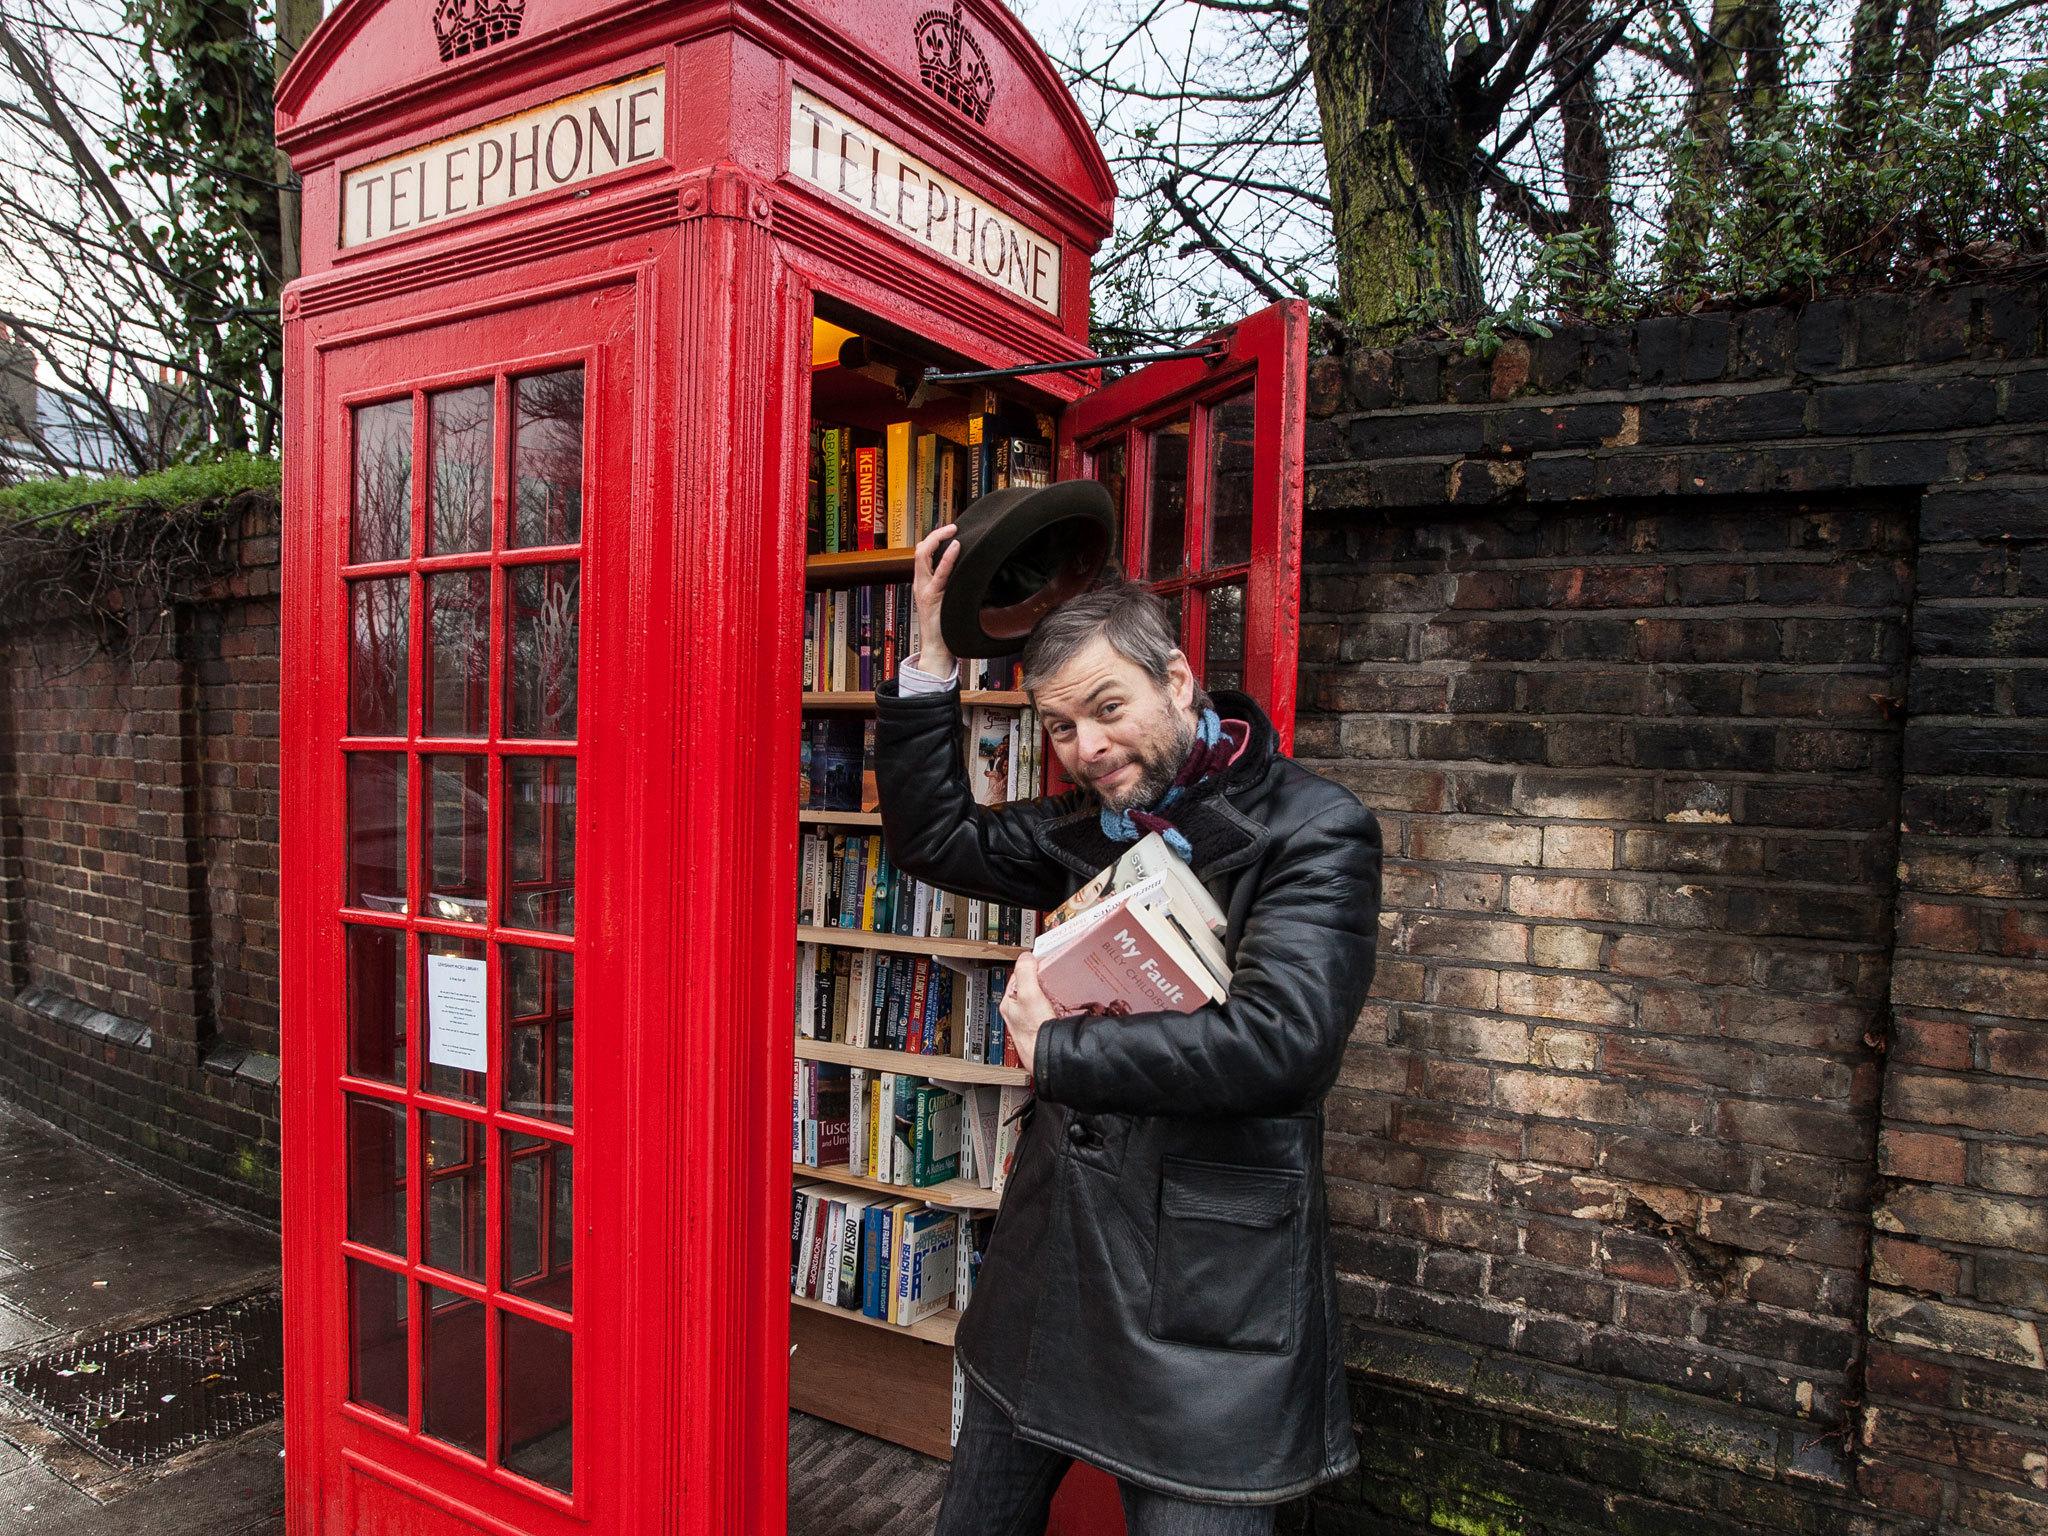 15 lush things to do on Lewisham Way